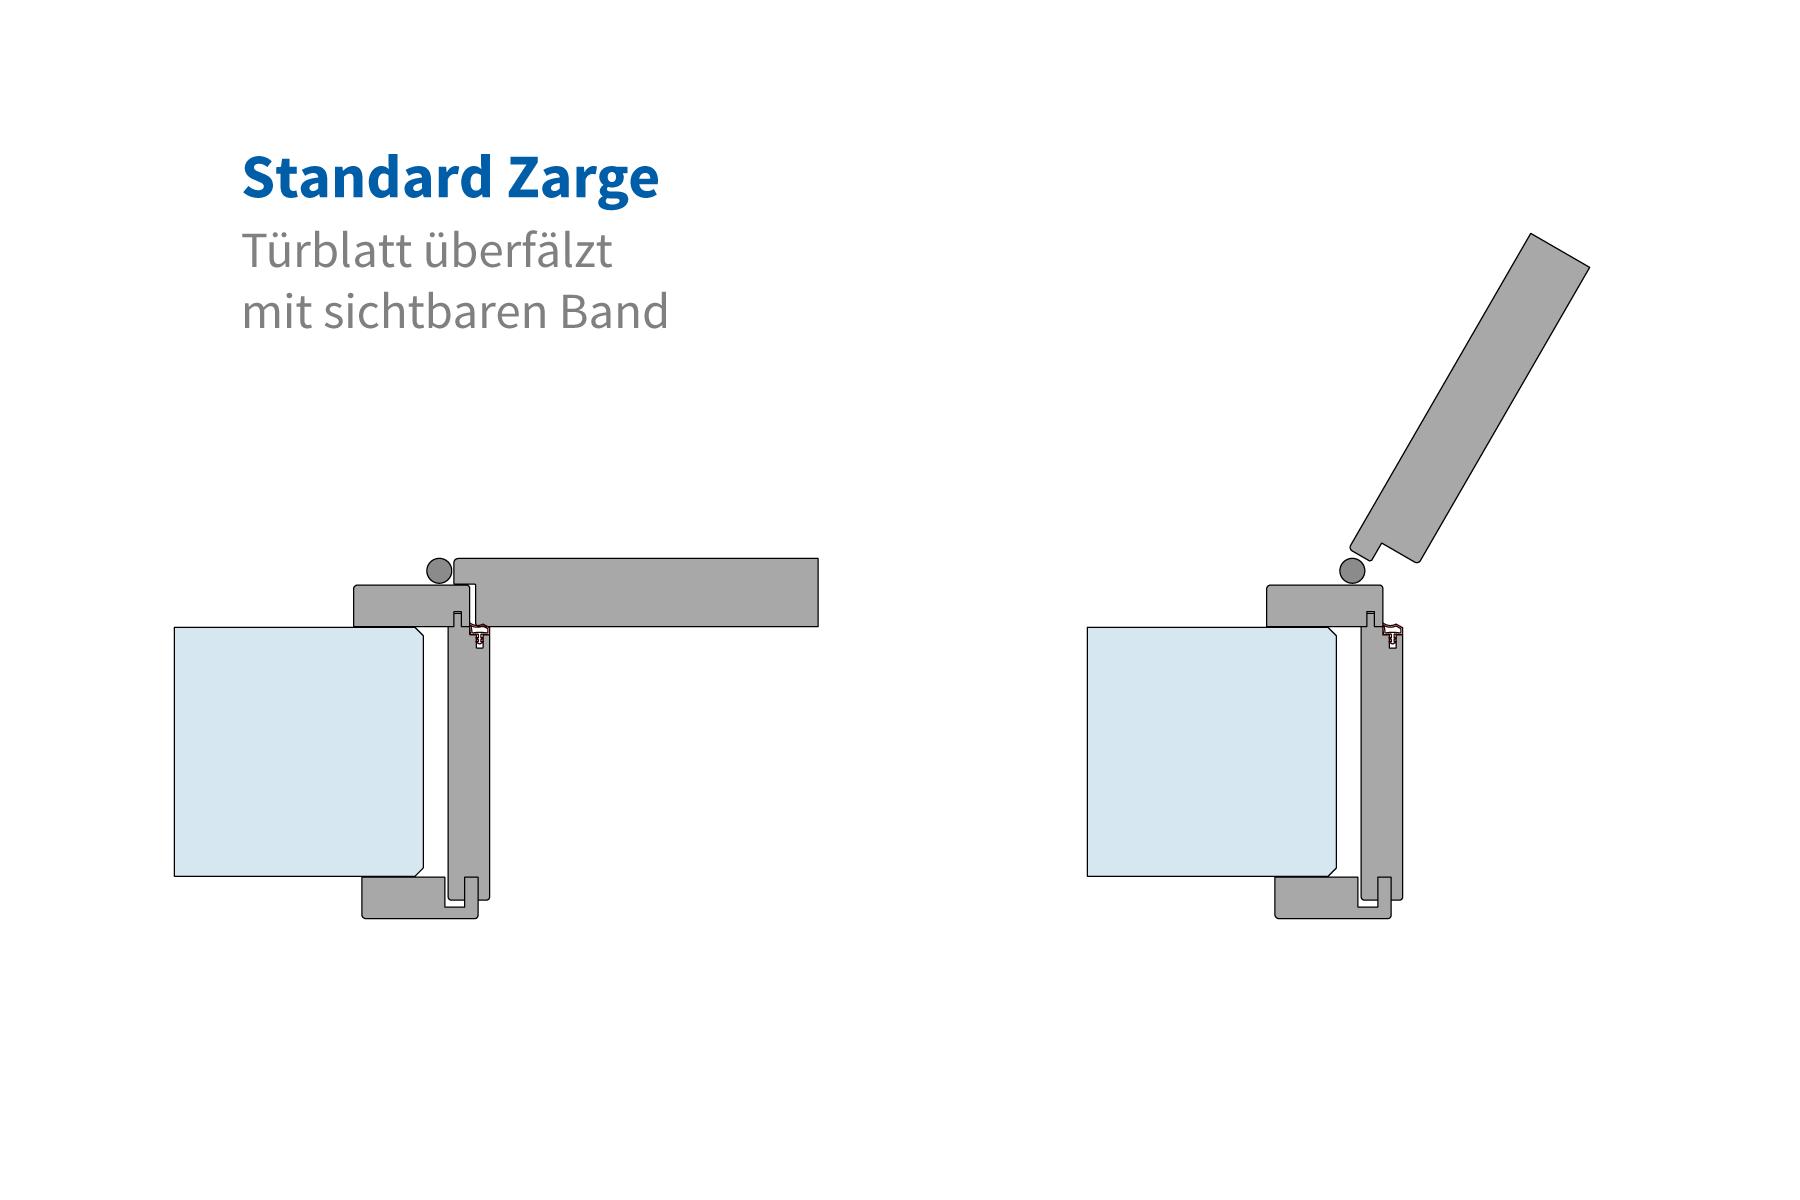 Standard Zarge